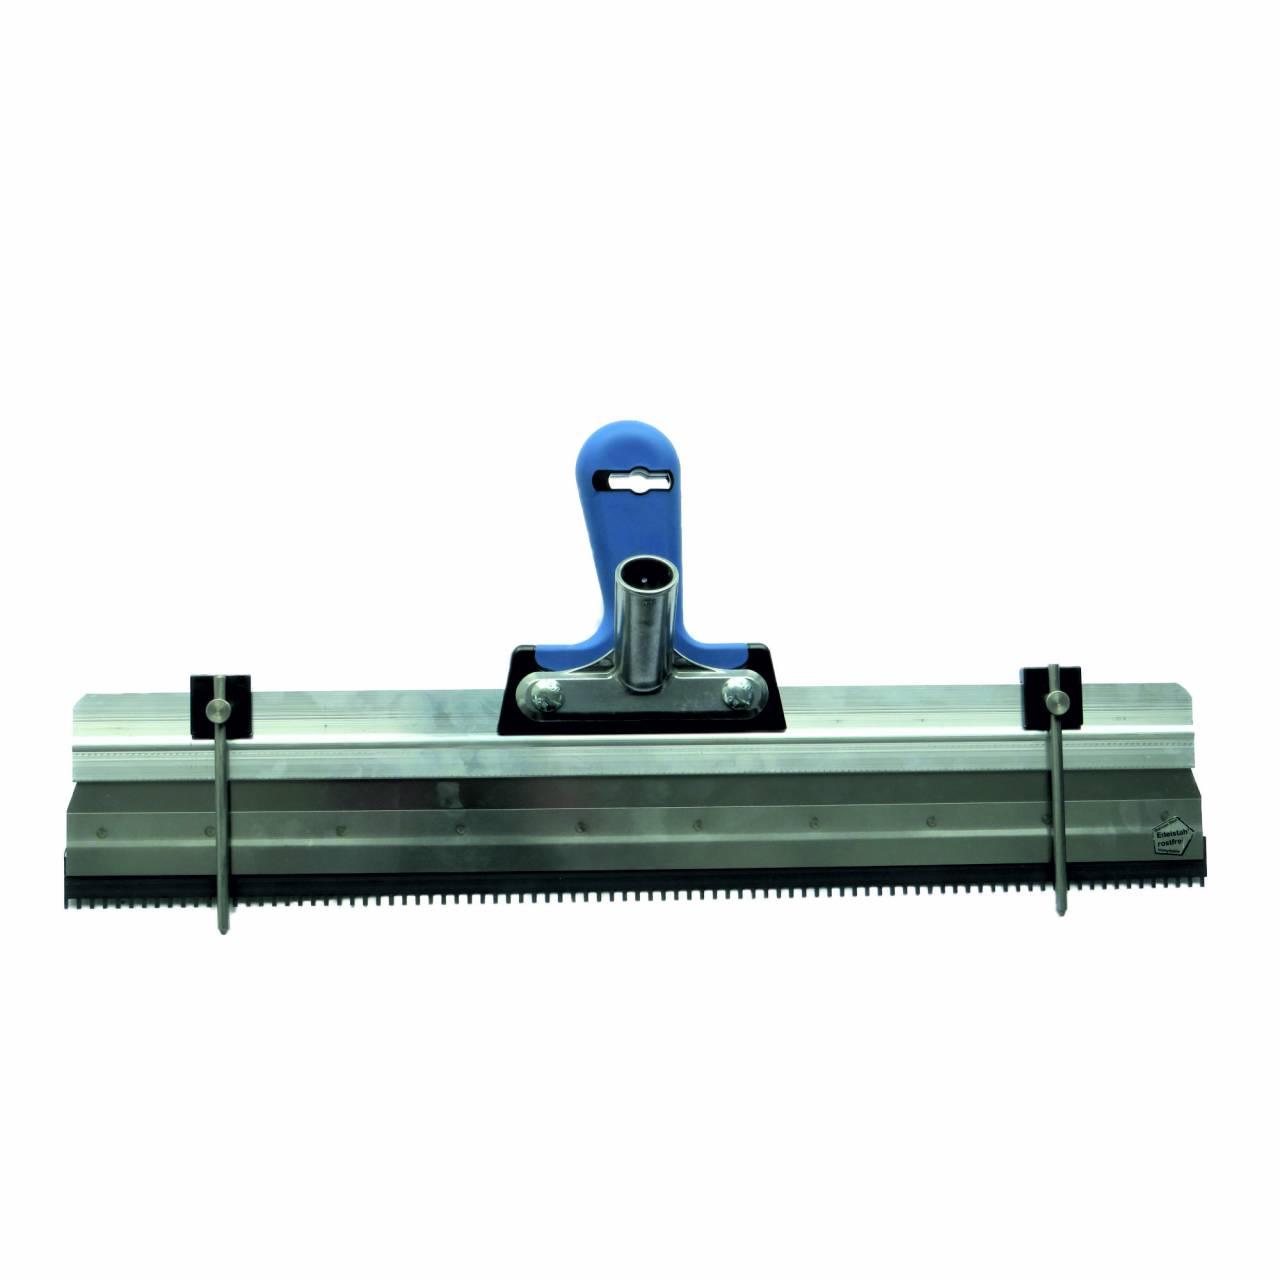 Stehrakel 560 mm, Zahnung 2 x 4 x 5 mm